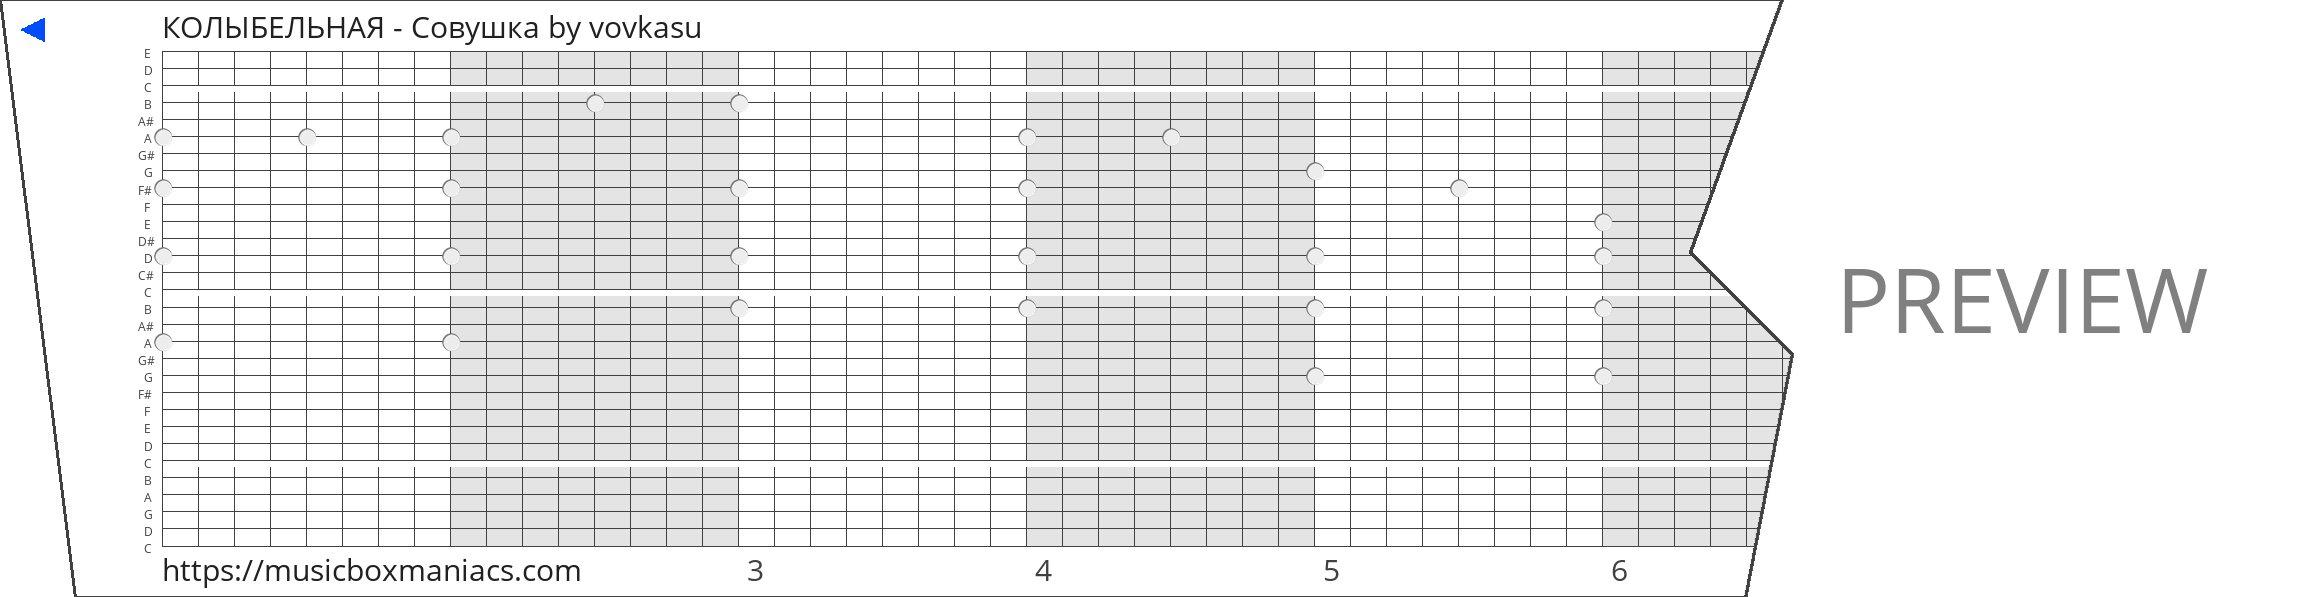 КОЛЫБЕЛЬНАЯ - Совушка 30 note music box paper strip